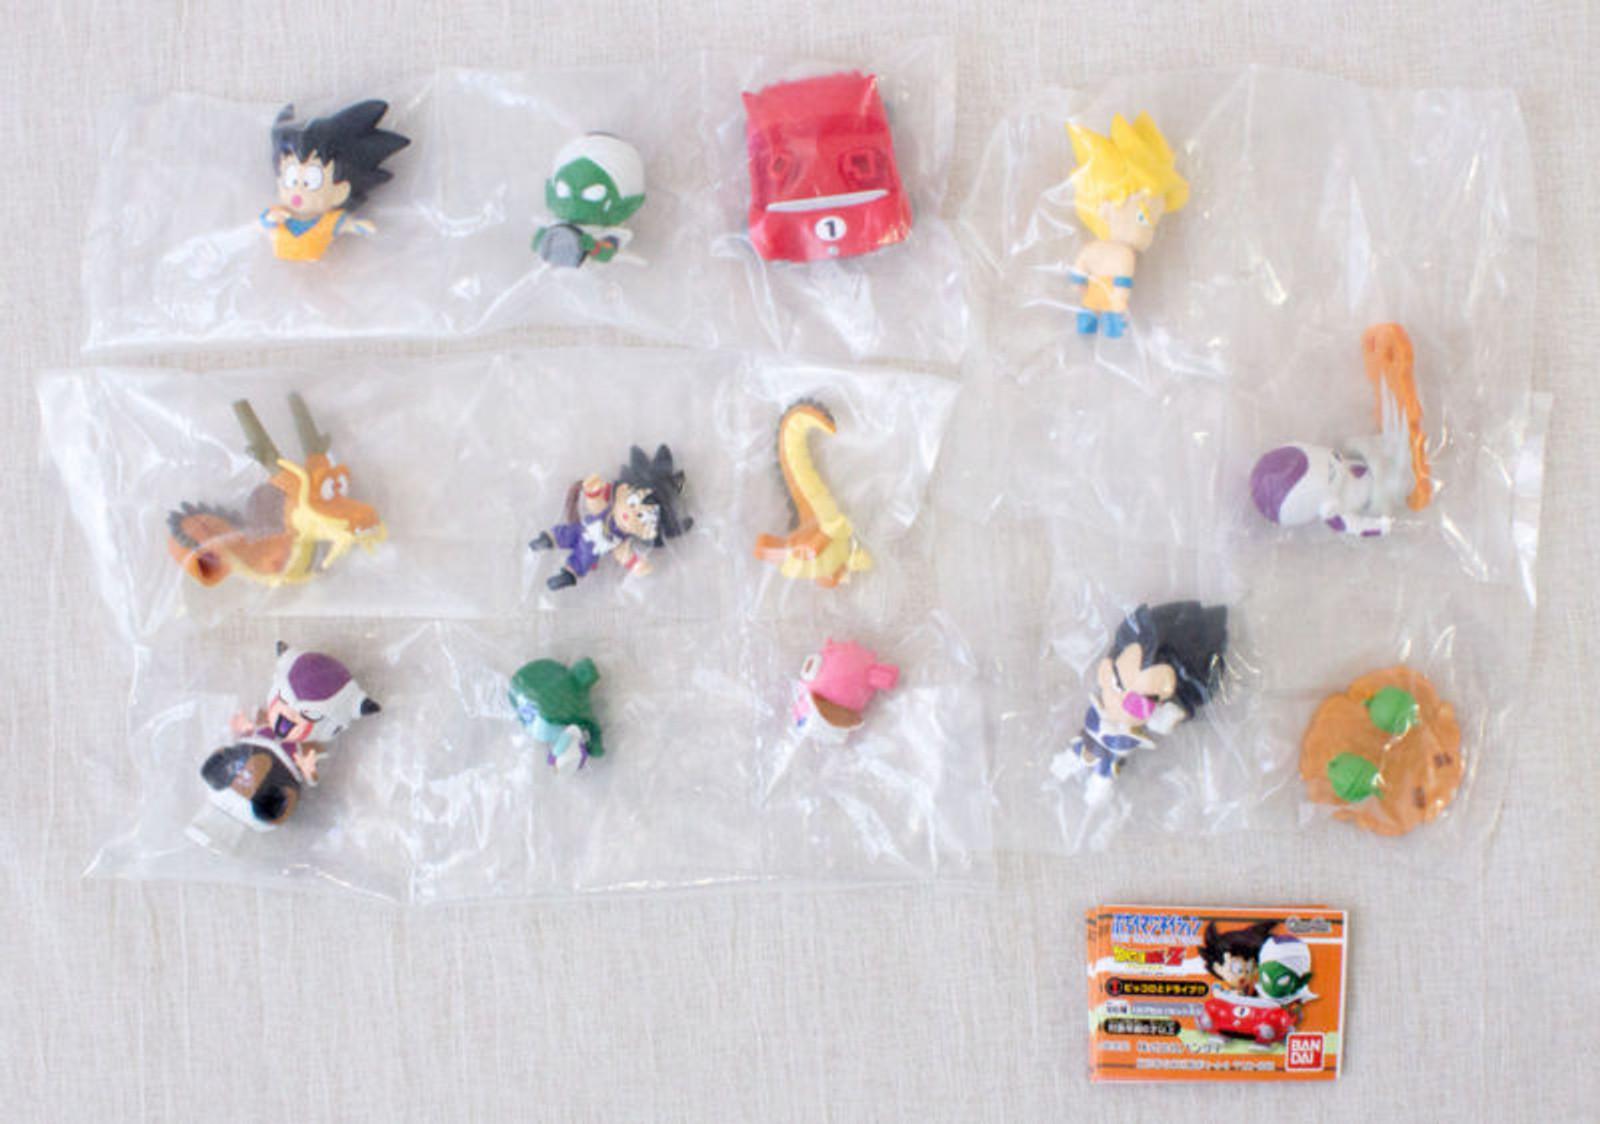 Bandai Anime Summon Night 3 Gashapon Figure Keychain Set of 5